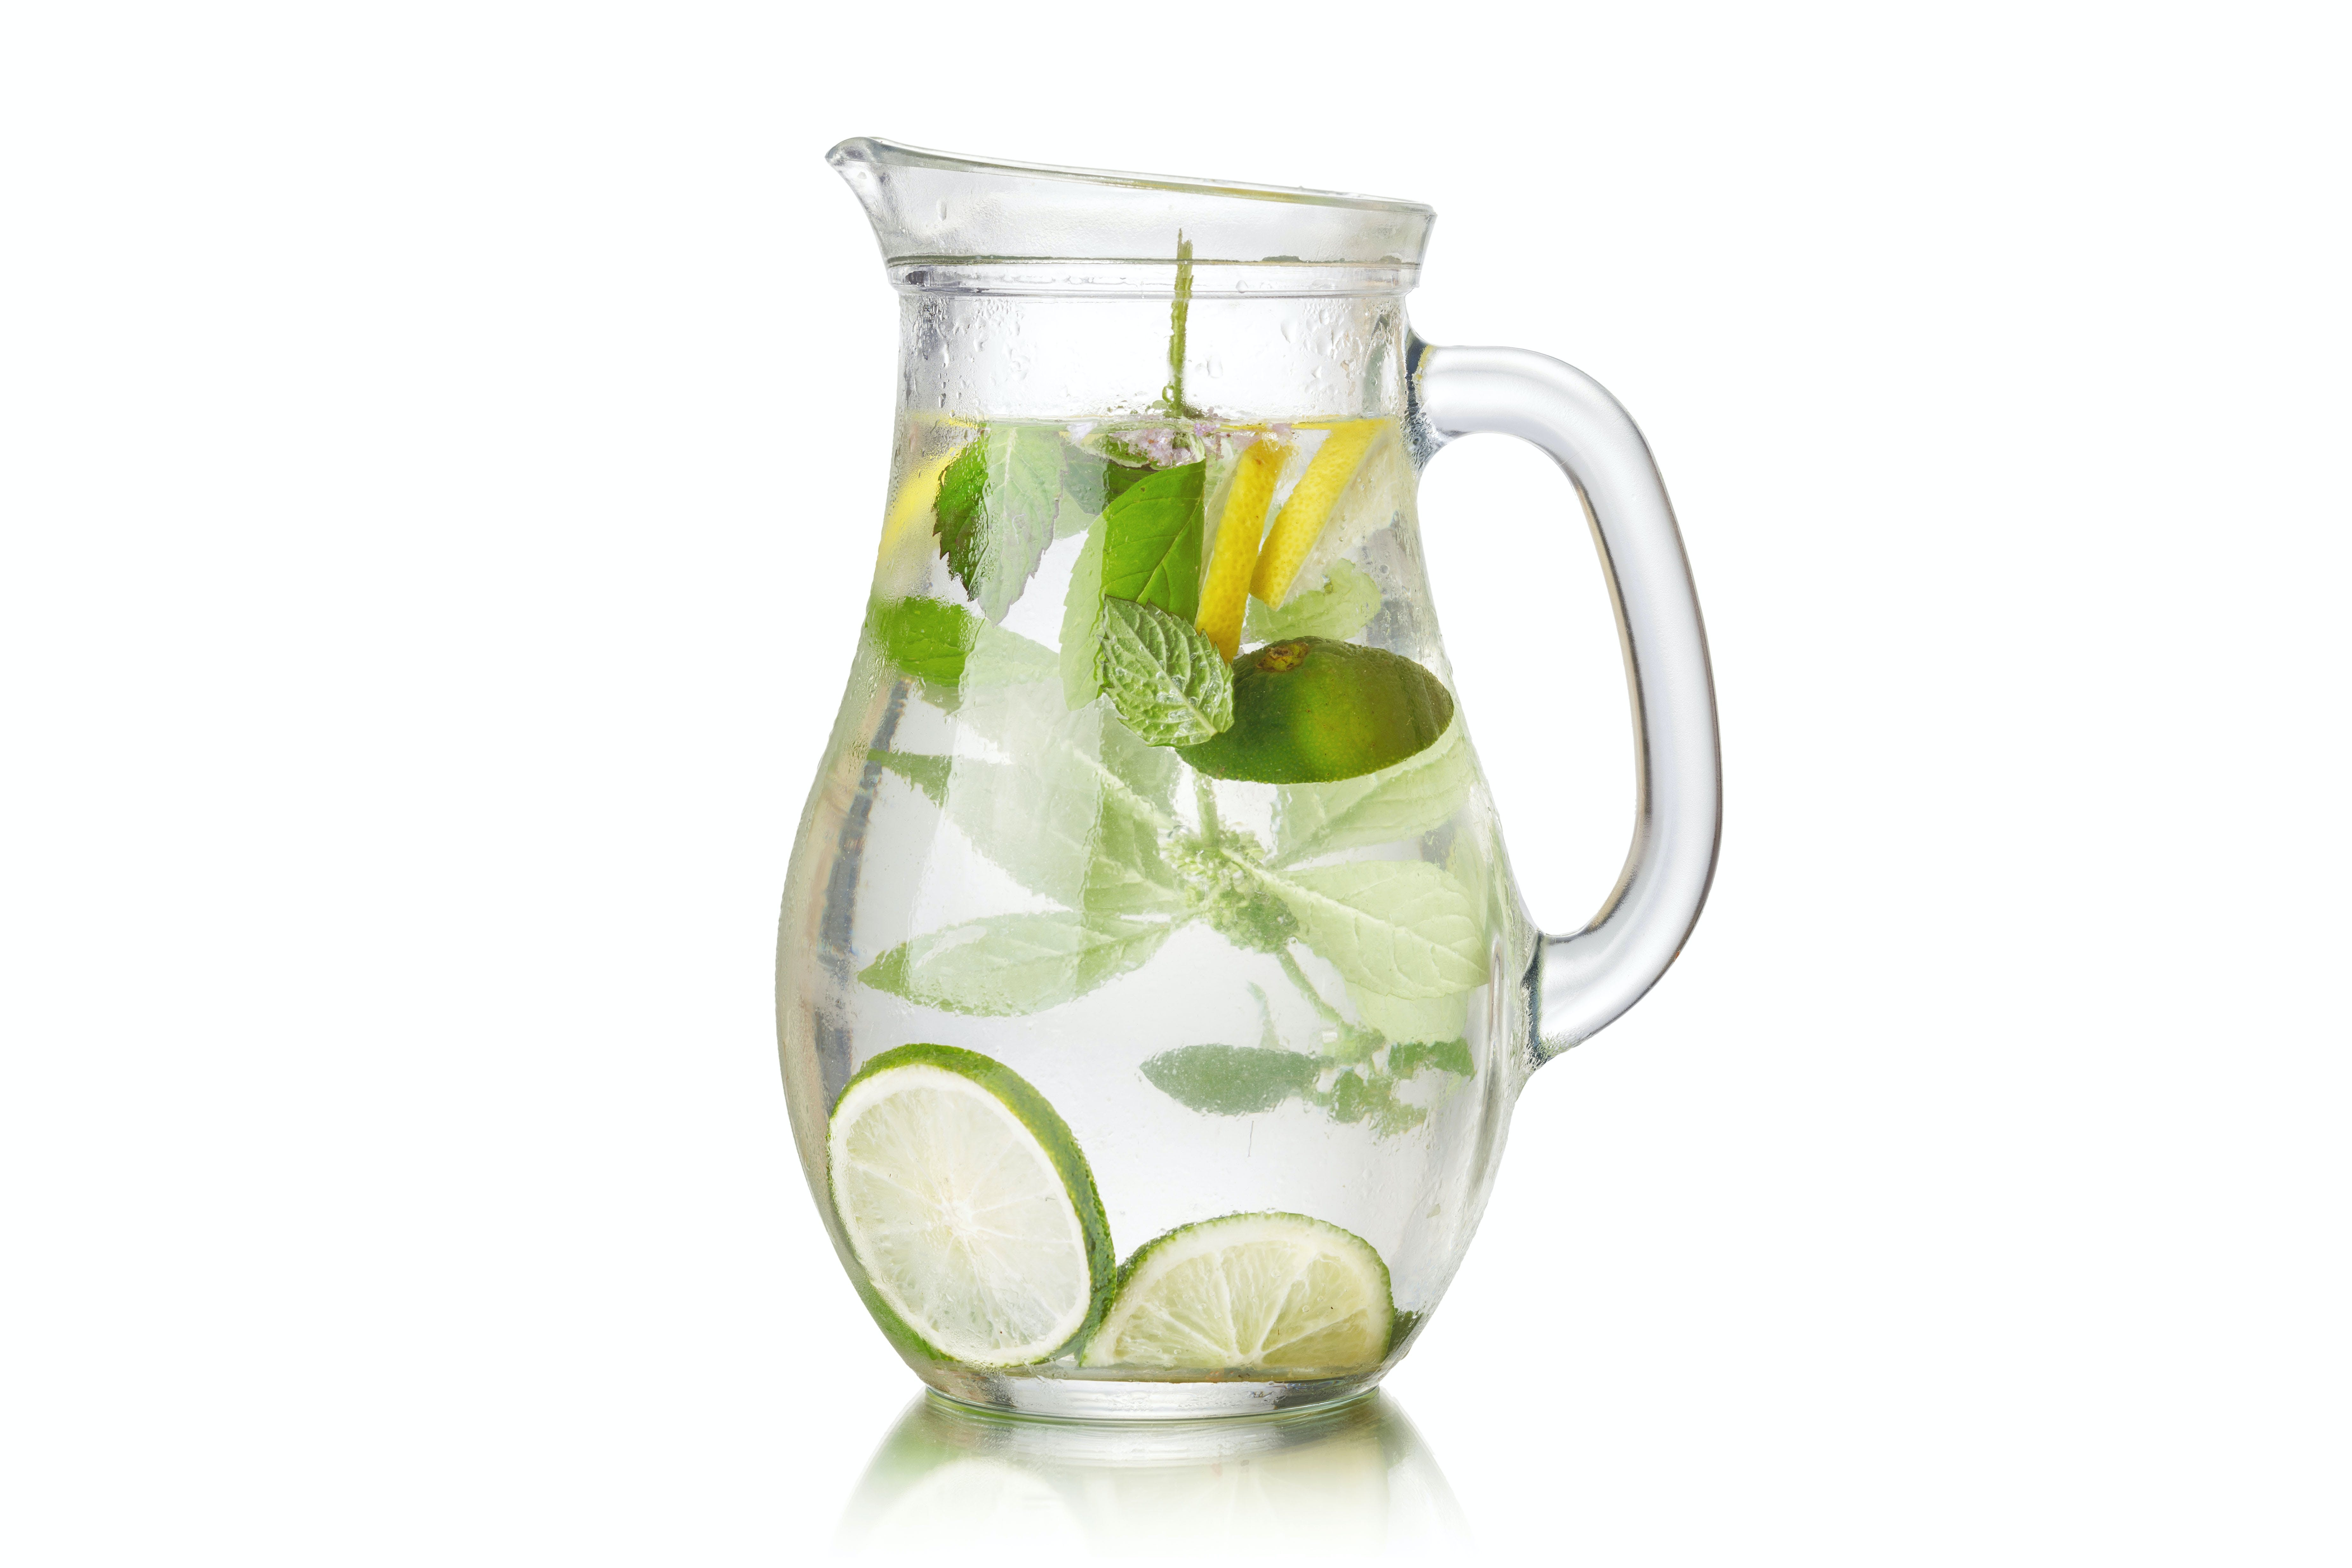 Hvorfor flyder citronen, når limen synker?